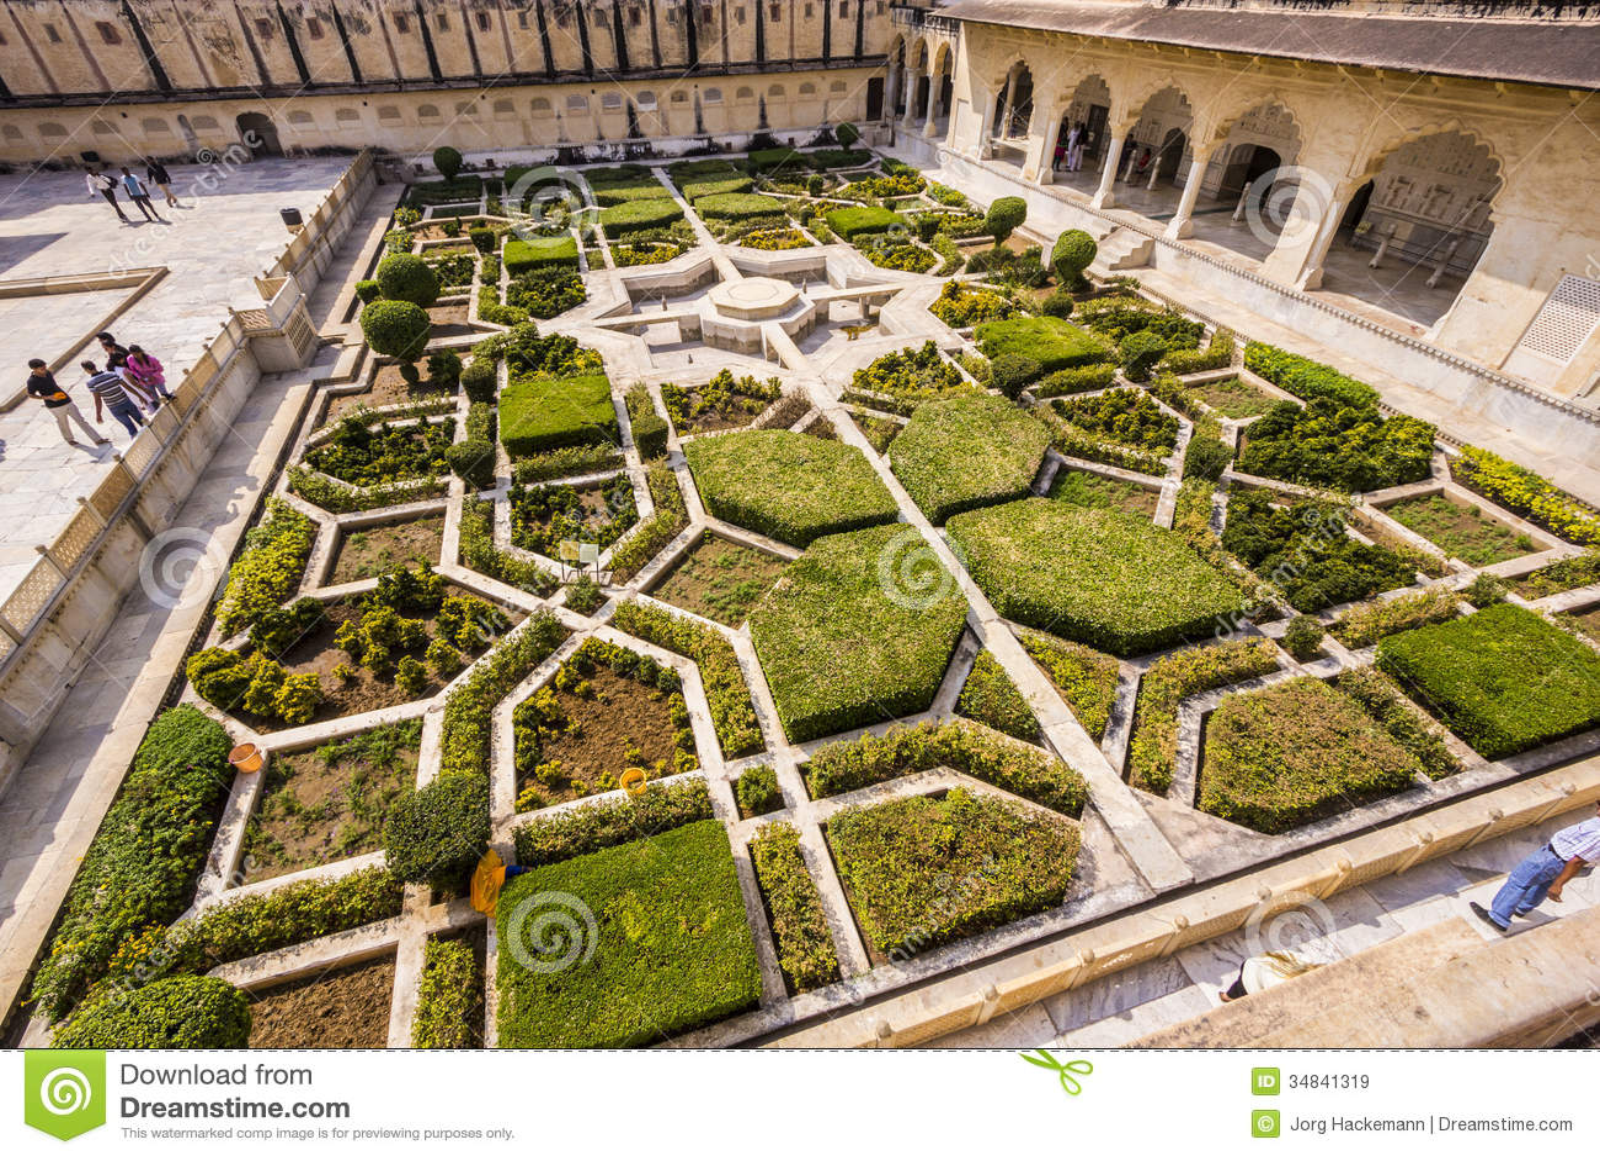 Beautiful gardens in amer fort editorial stock image for Gardening tools jaipur